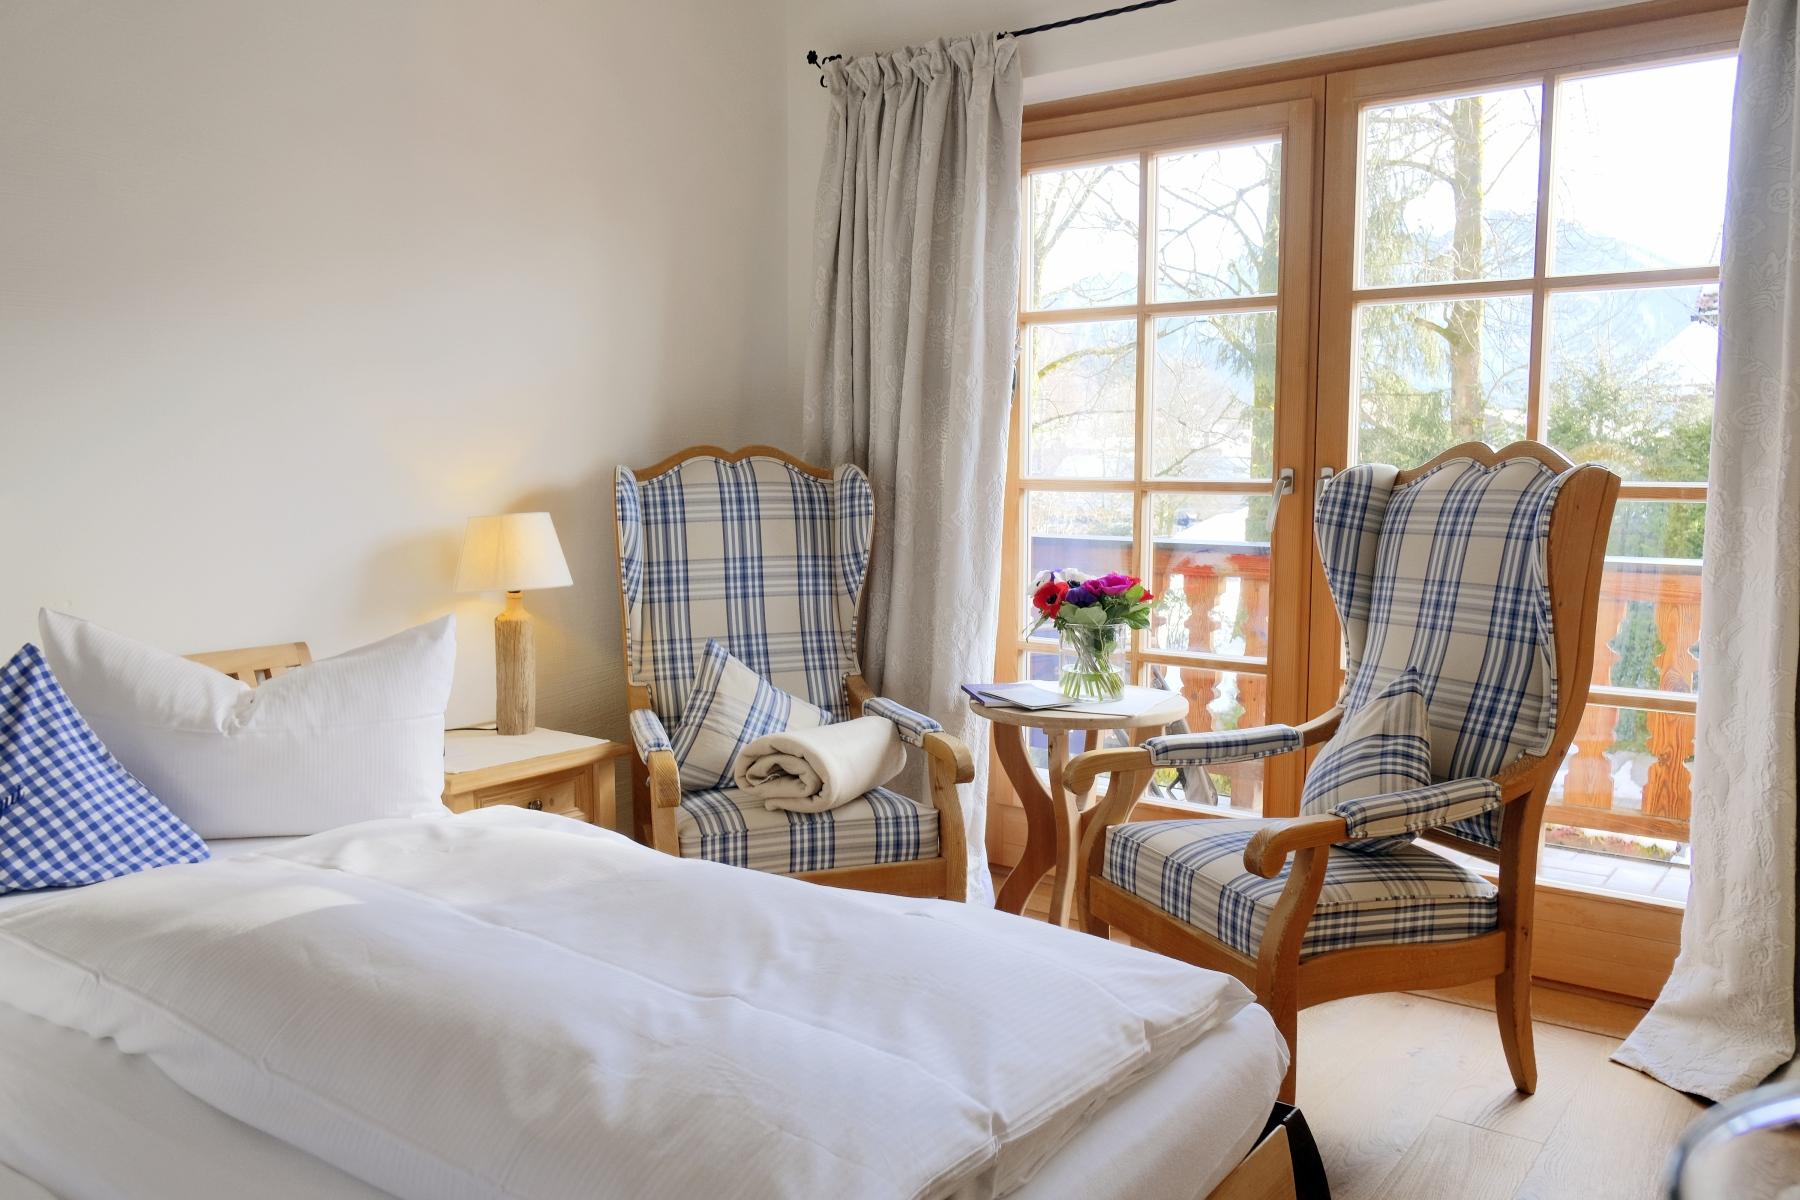 Small hotel room